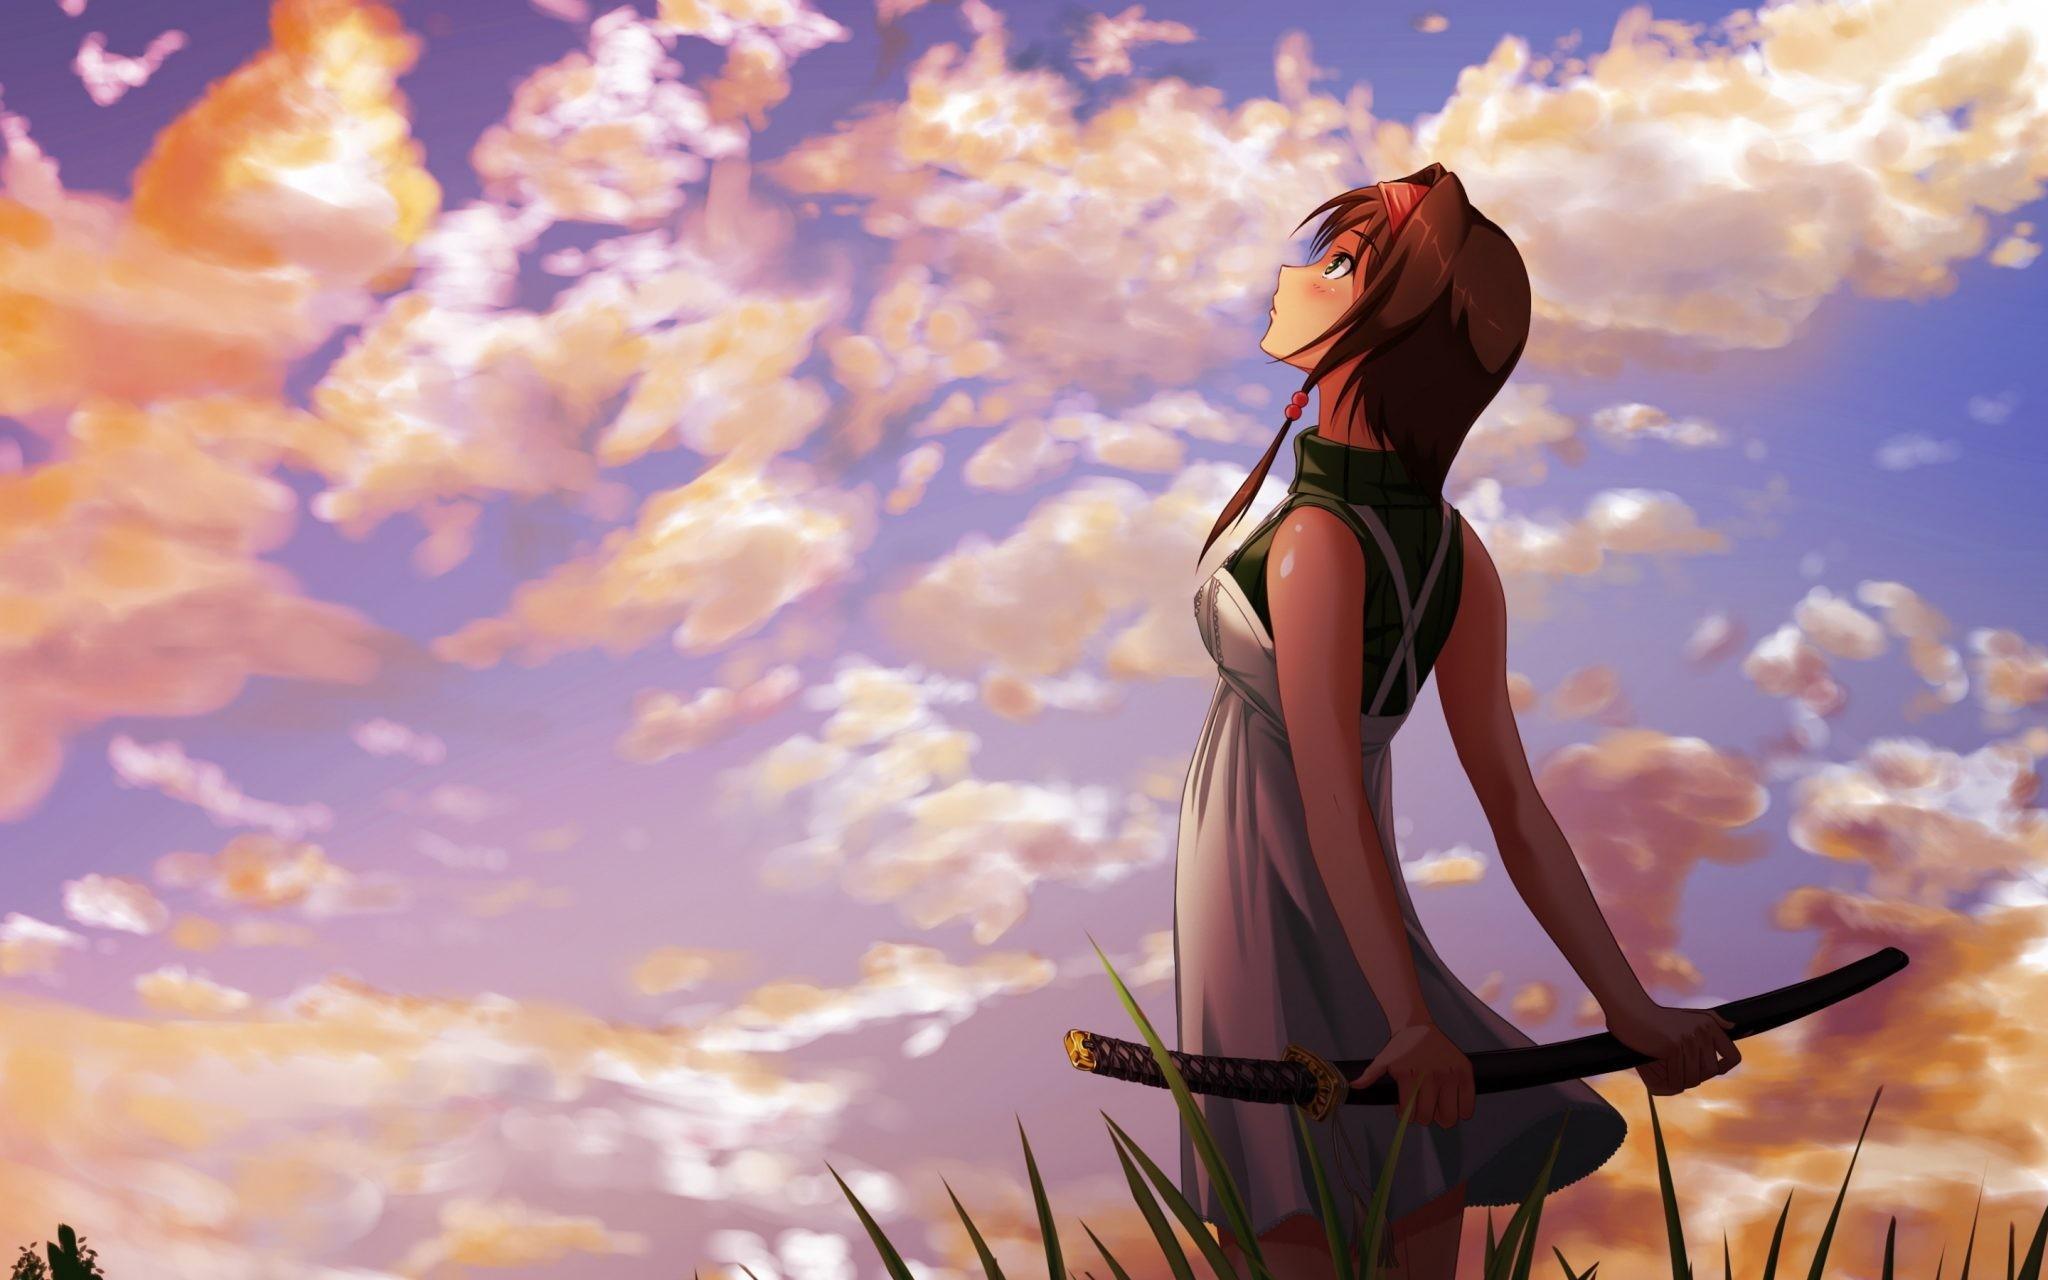 … Fantastic 4K Wallpapers Anime Girl Wallpaper in Wallpaper 4K- you can  download Anime Girl Wallpaper